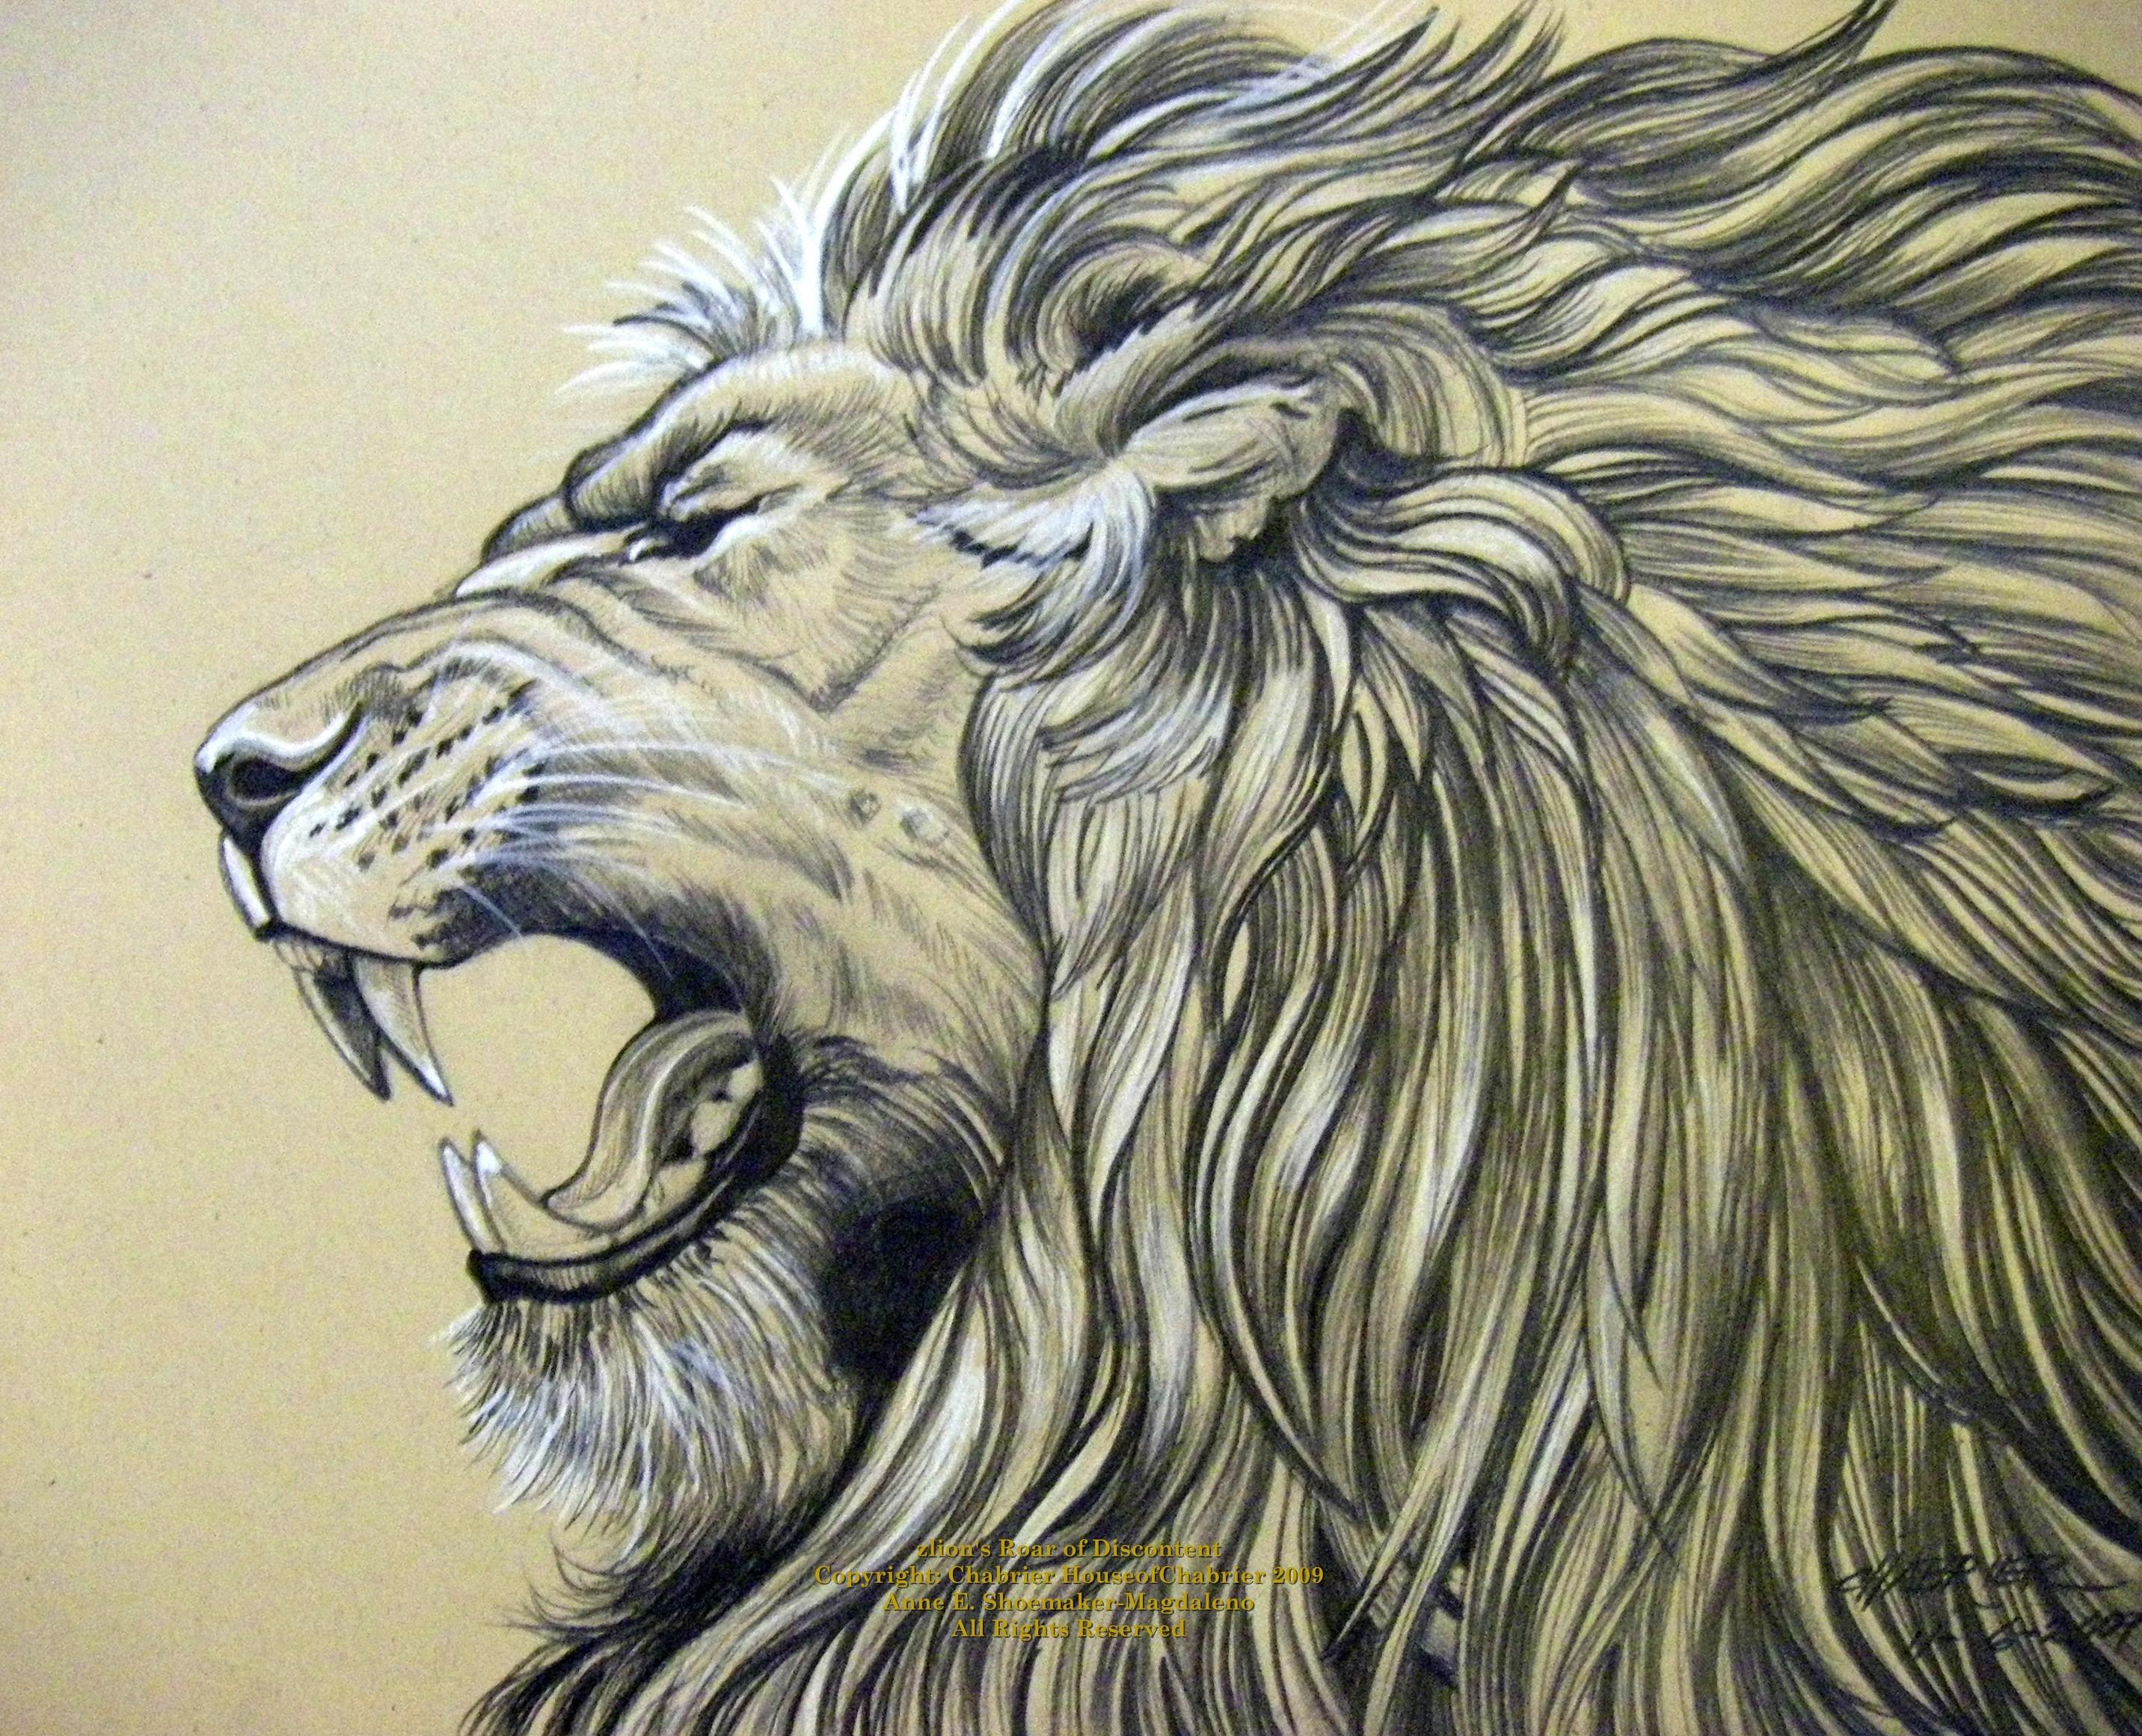 2864x2321 Pencil Sketch Of Roaring Lion